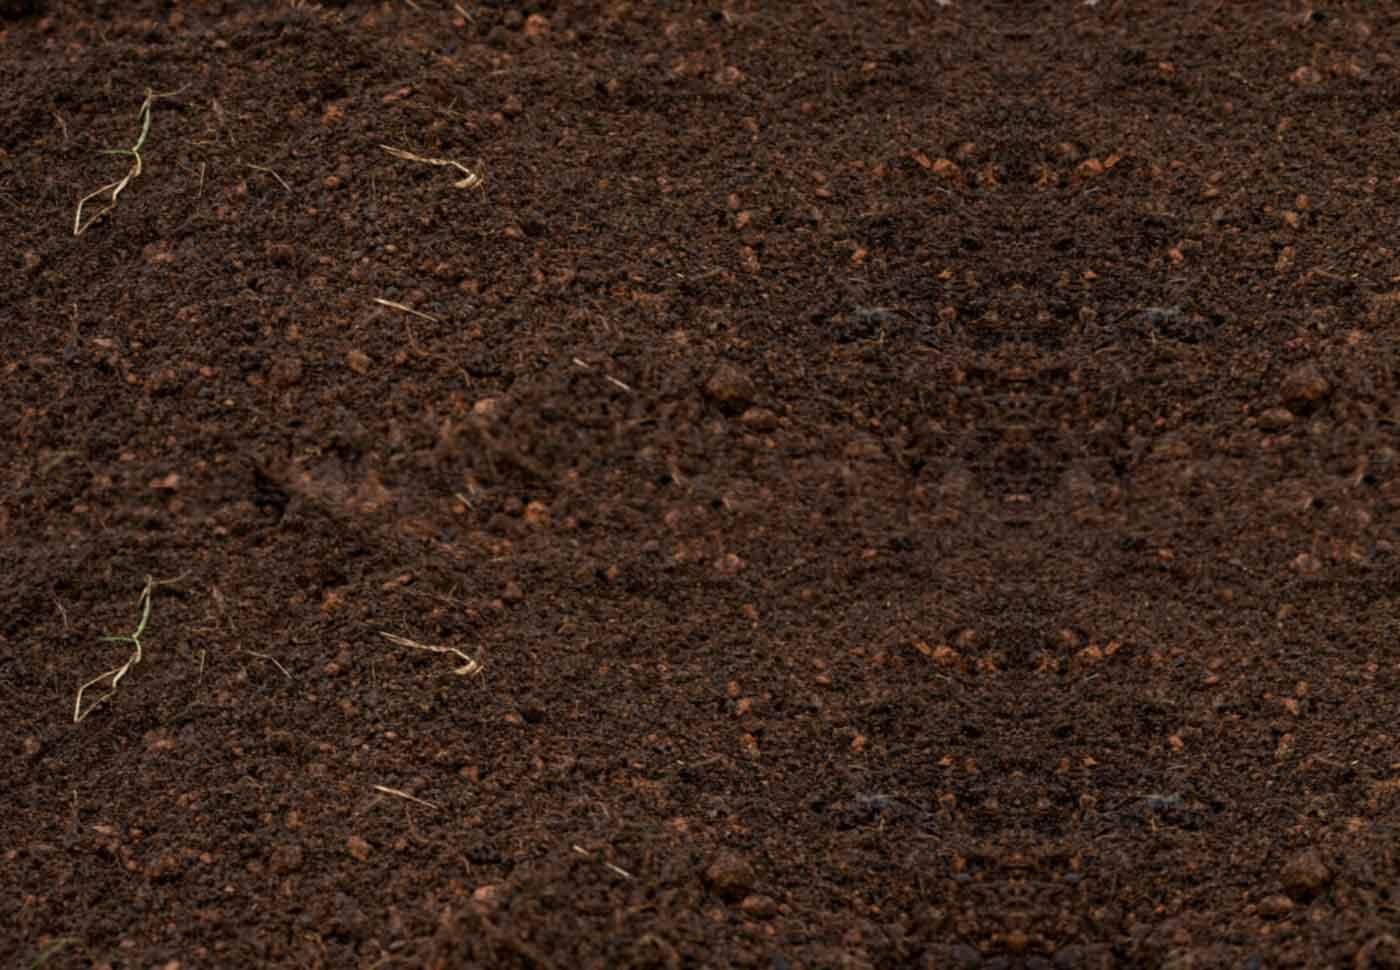 Soil Health Evaluation